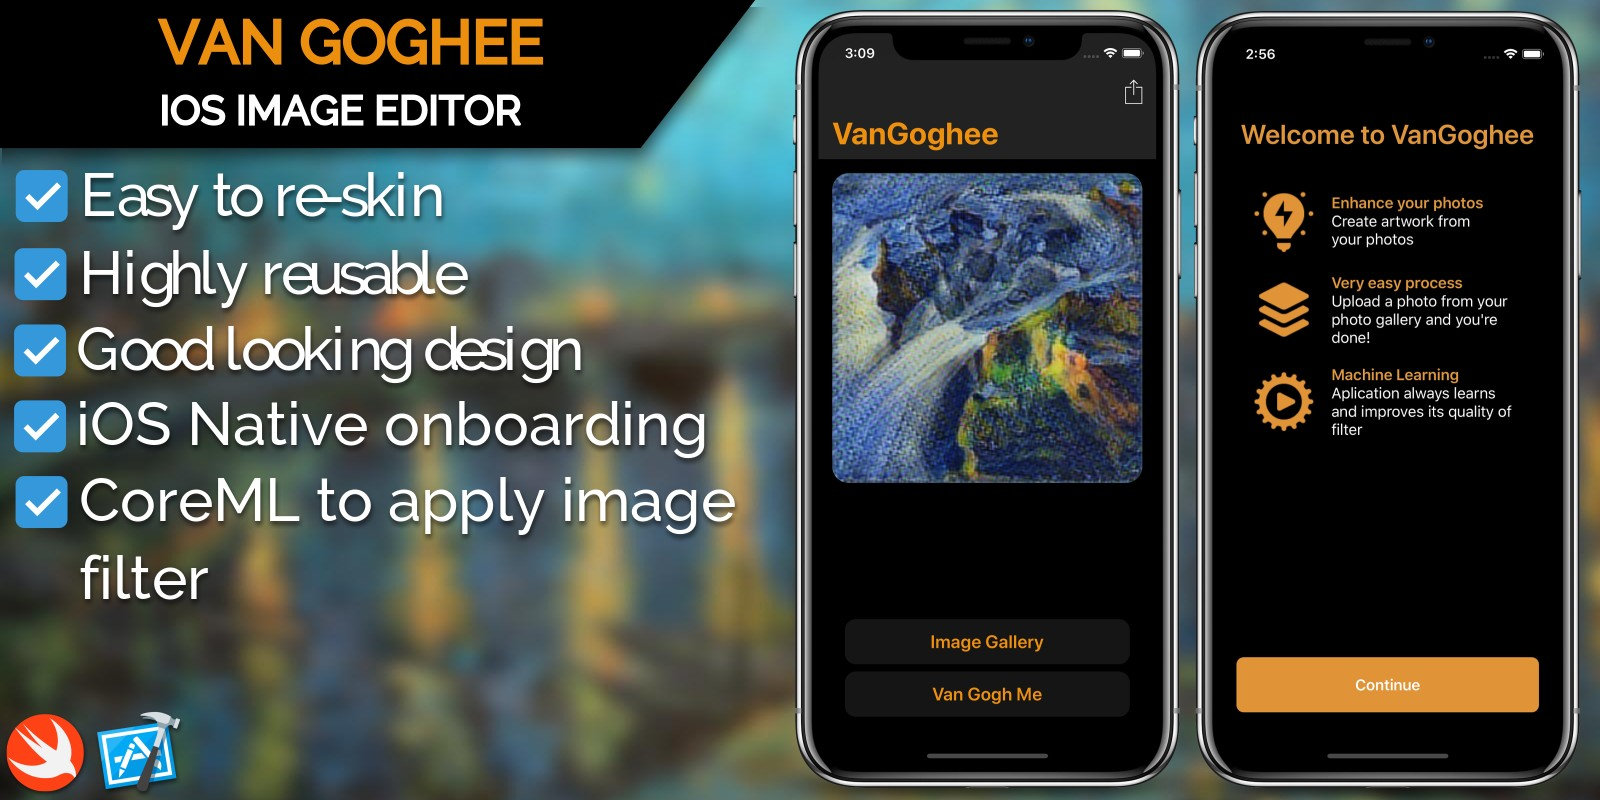 VanGoghee - iOS Image Filter Application